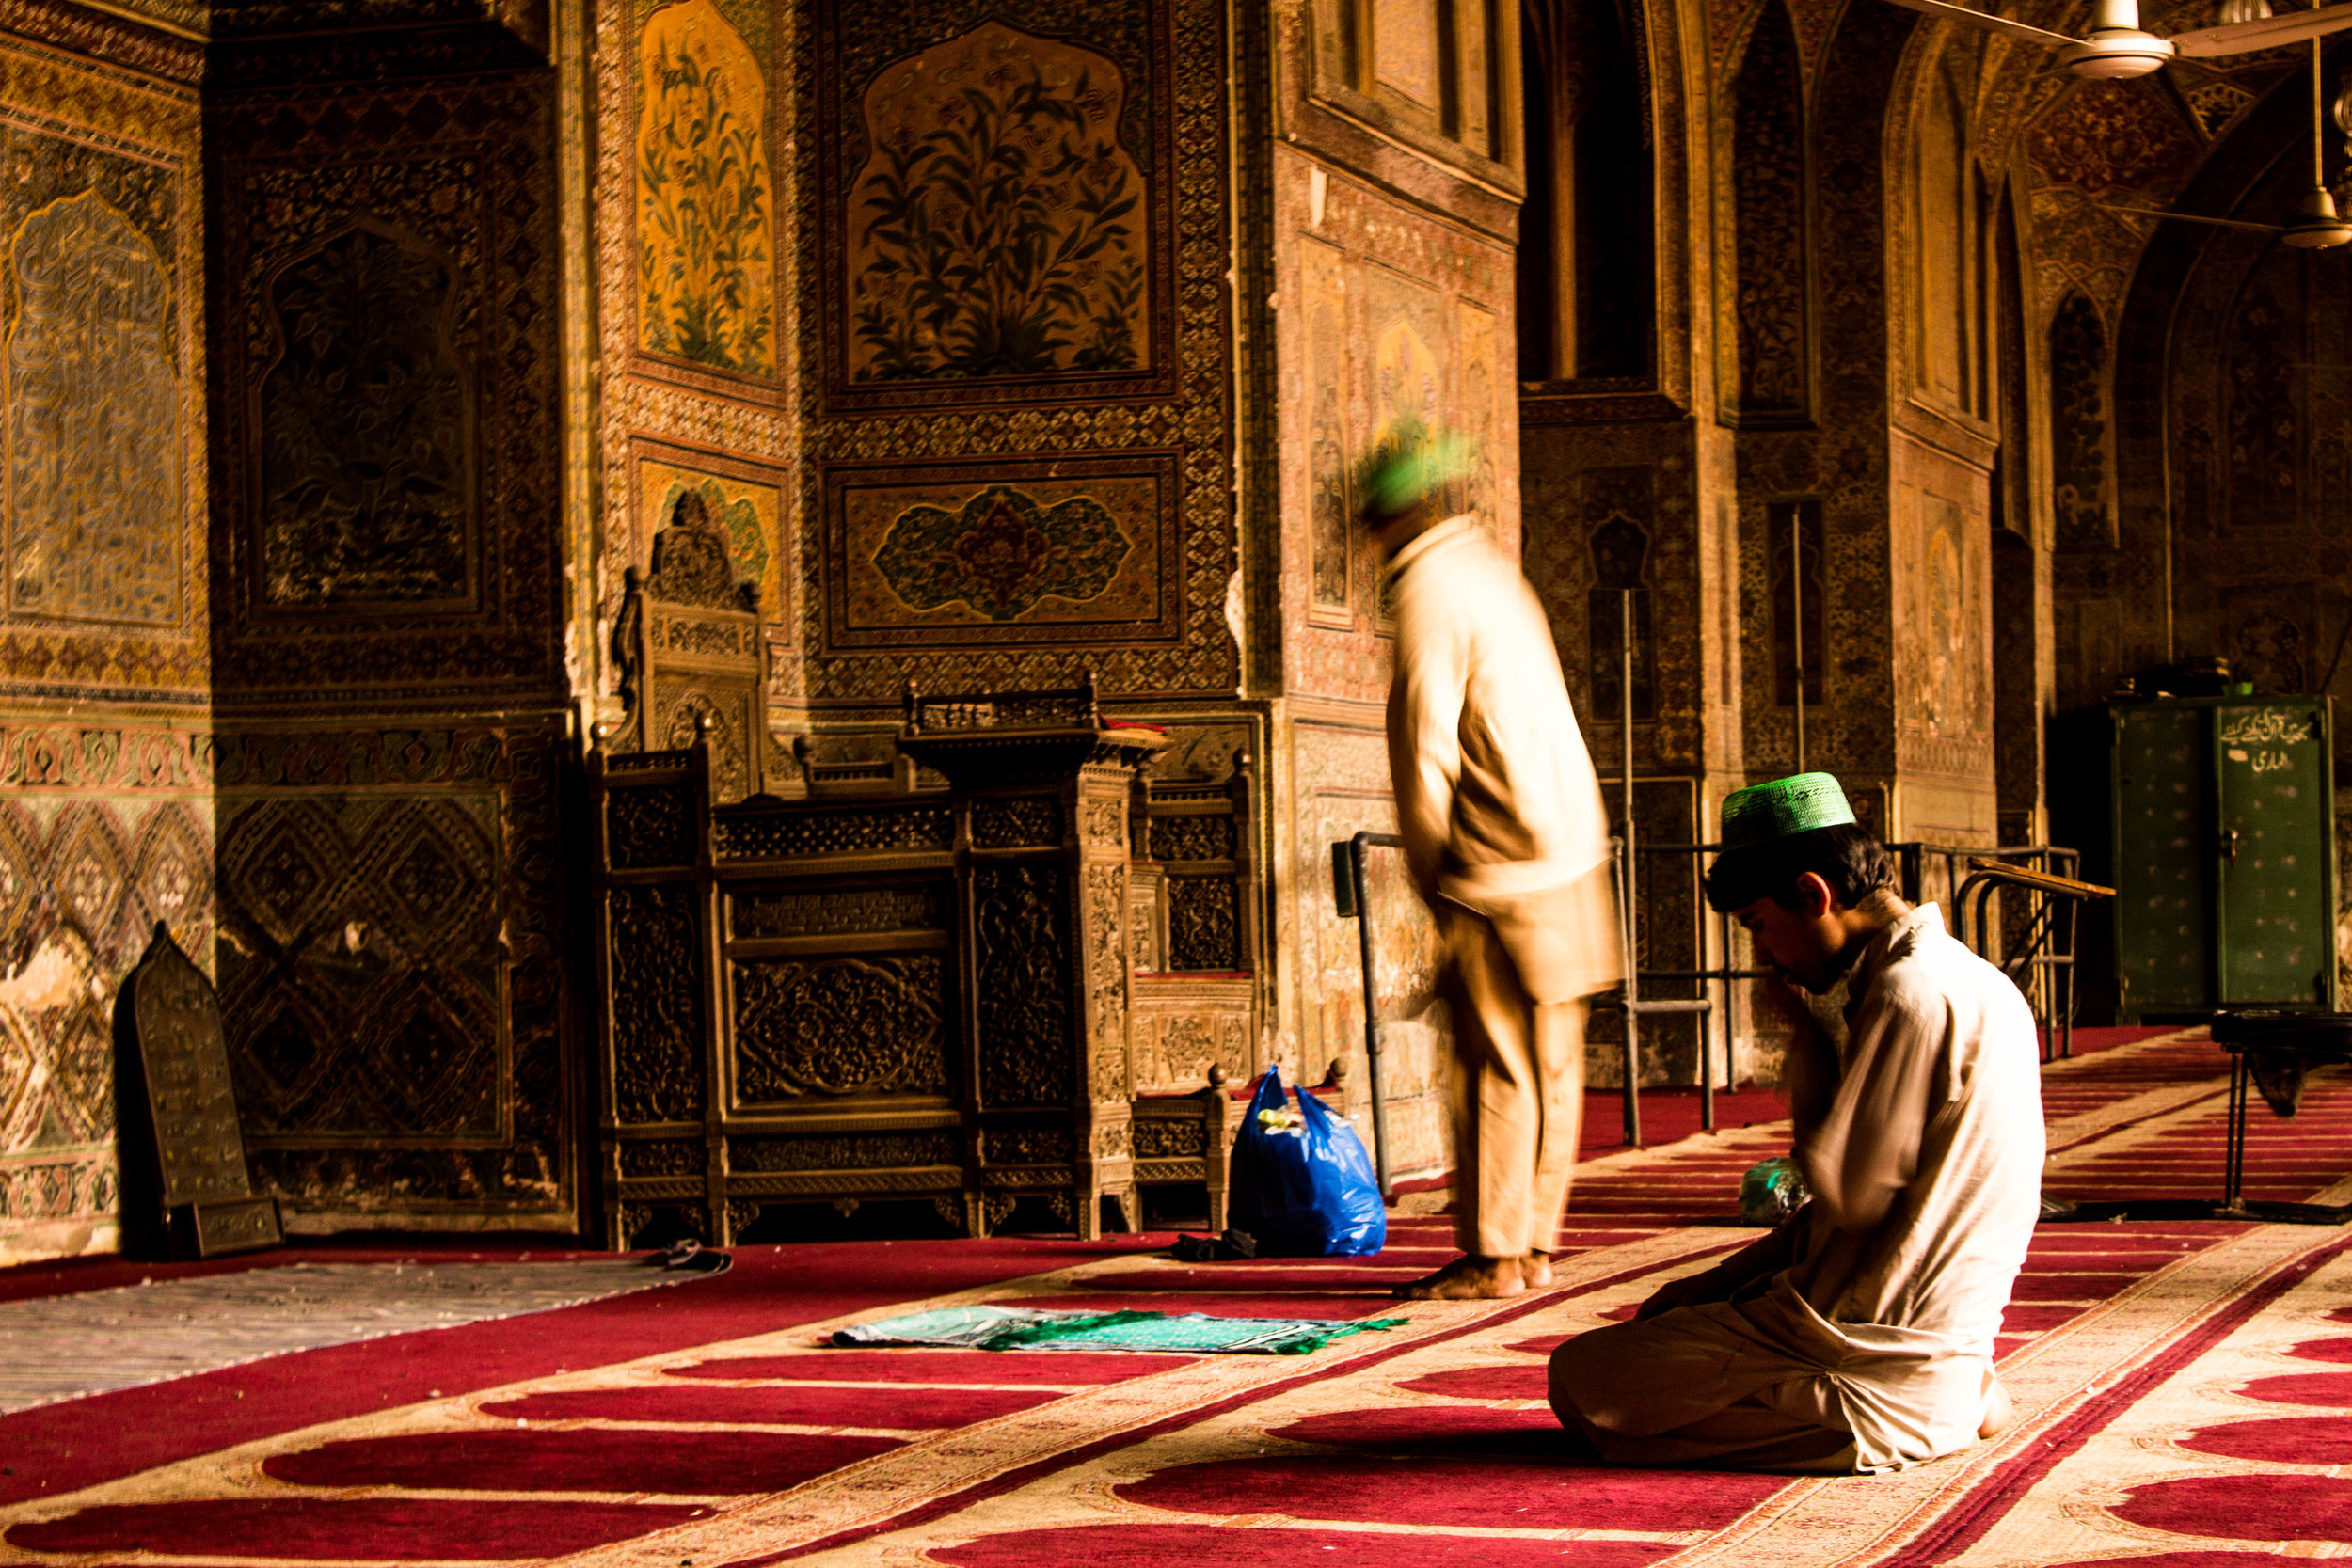 Men pray inside the main prayer area of the Wazir Khan Masjid in Old Lahore.